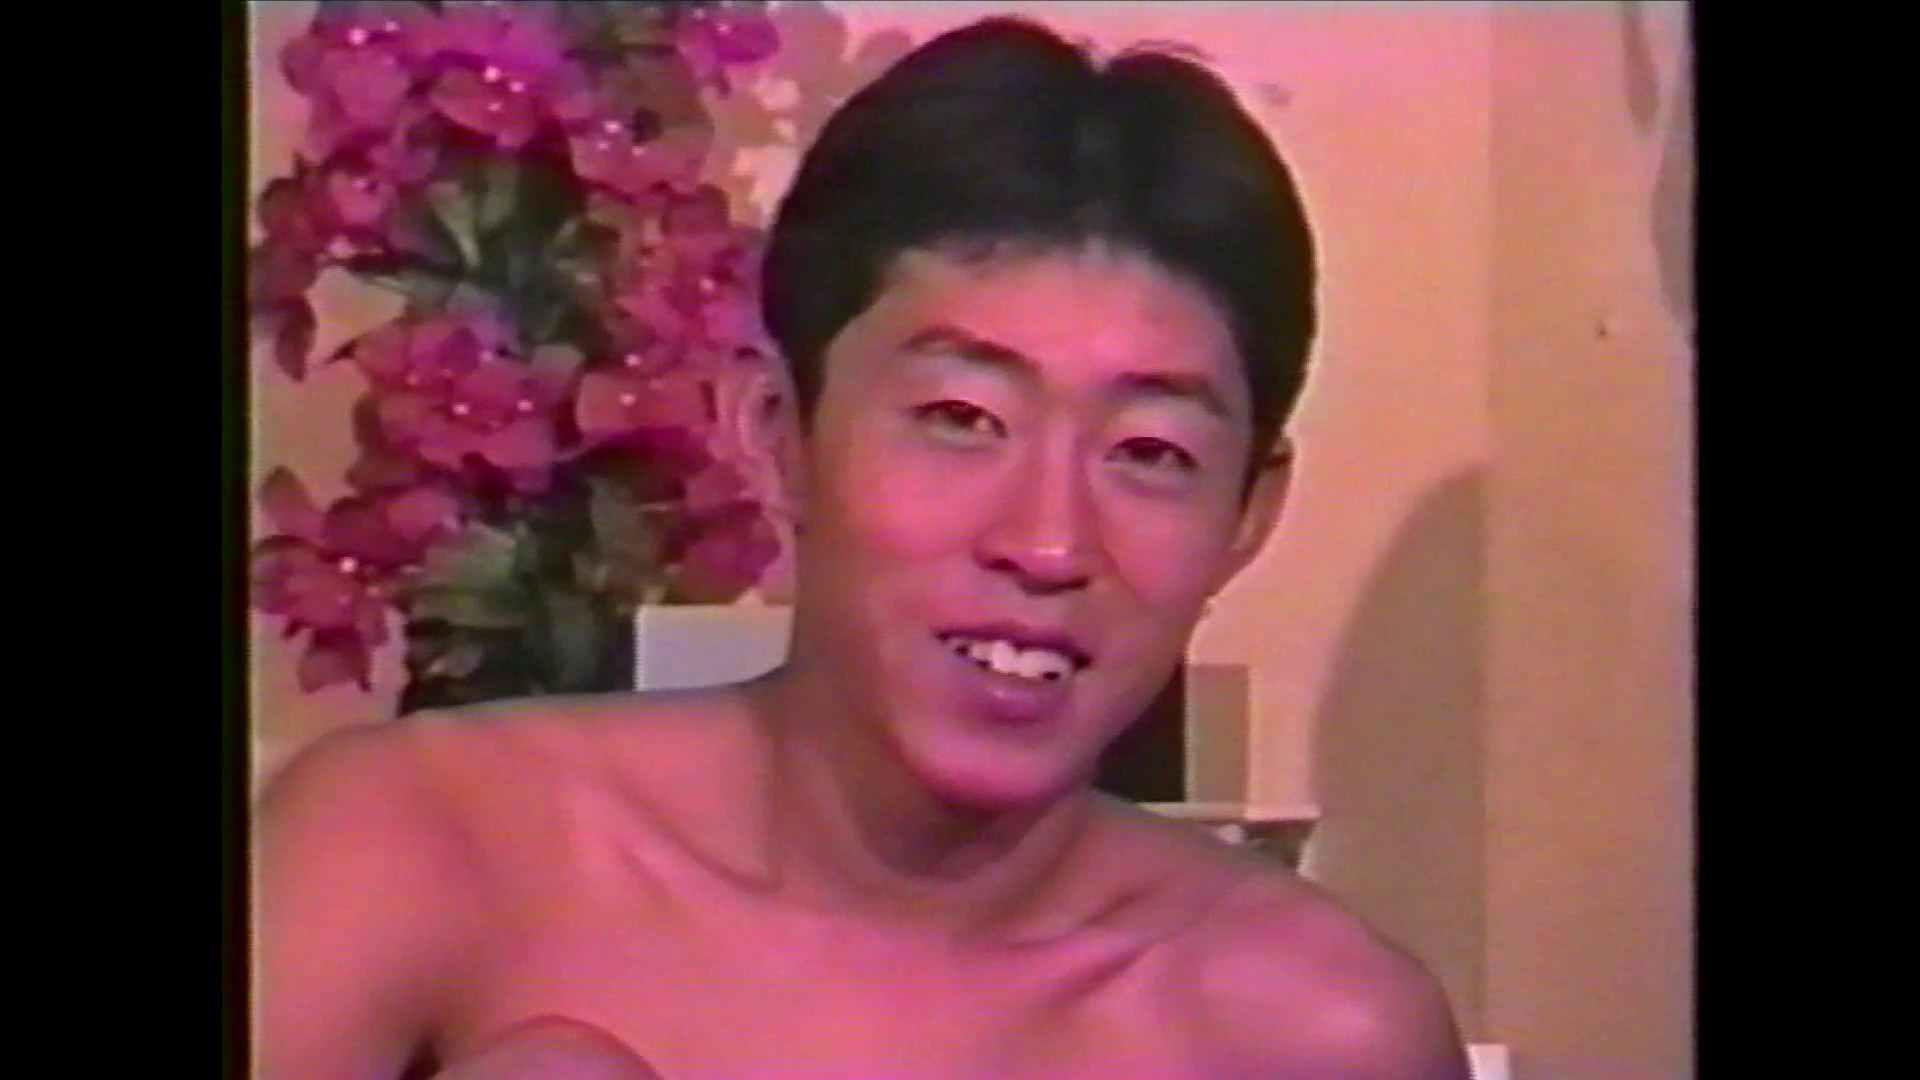 GAYBOY宏のオカズ倉庫Vol.12-2 完全無修正 | ゲイのペニス  78枚 13